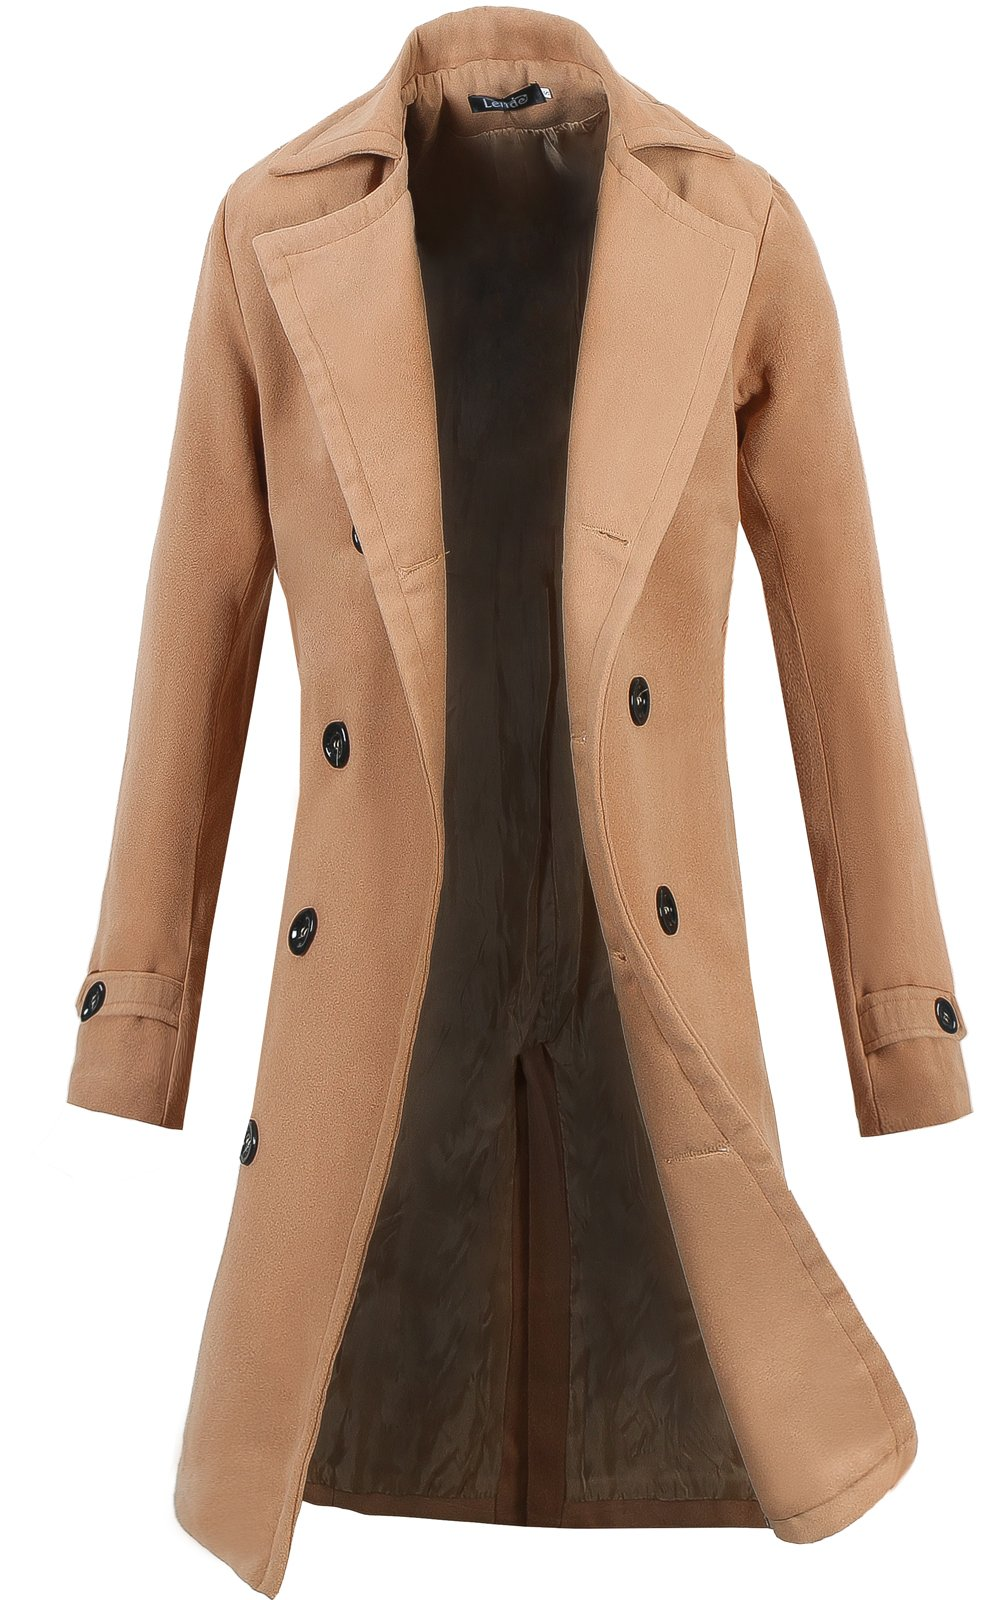 Lende Men's Trench Coat Winter Long Jacket Double Breasted Overcoat Khaki XL by Lende